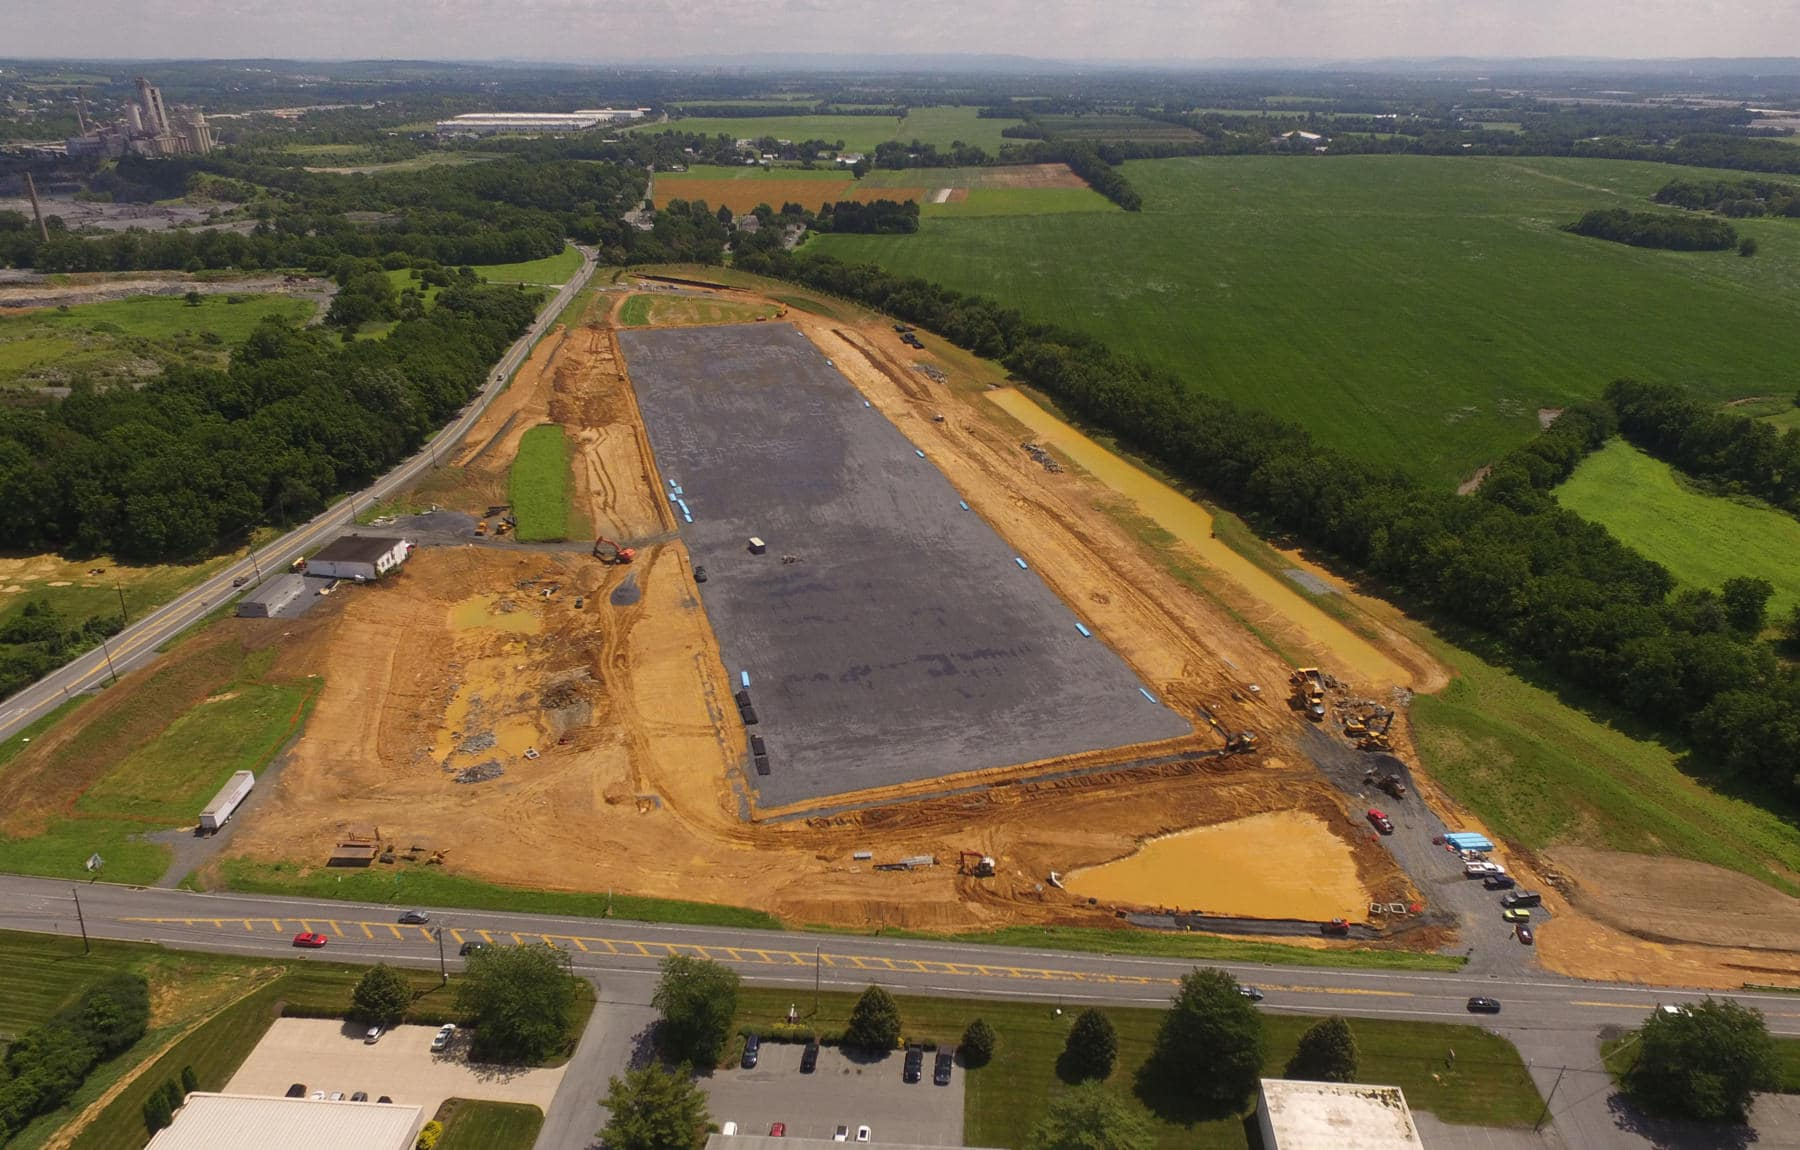 Lot 1 Airport Road Site Progression